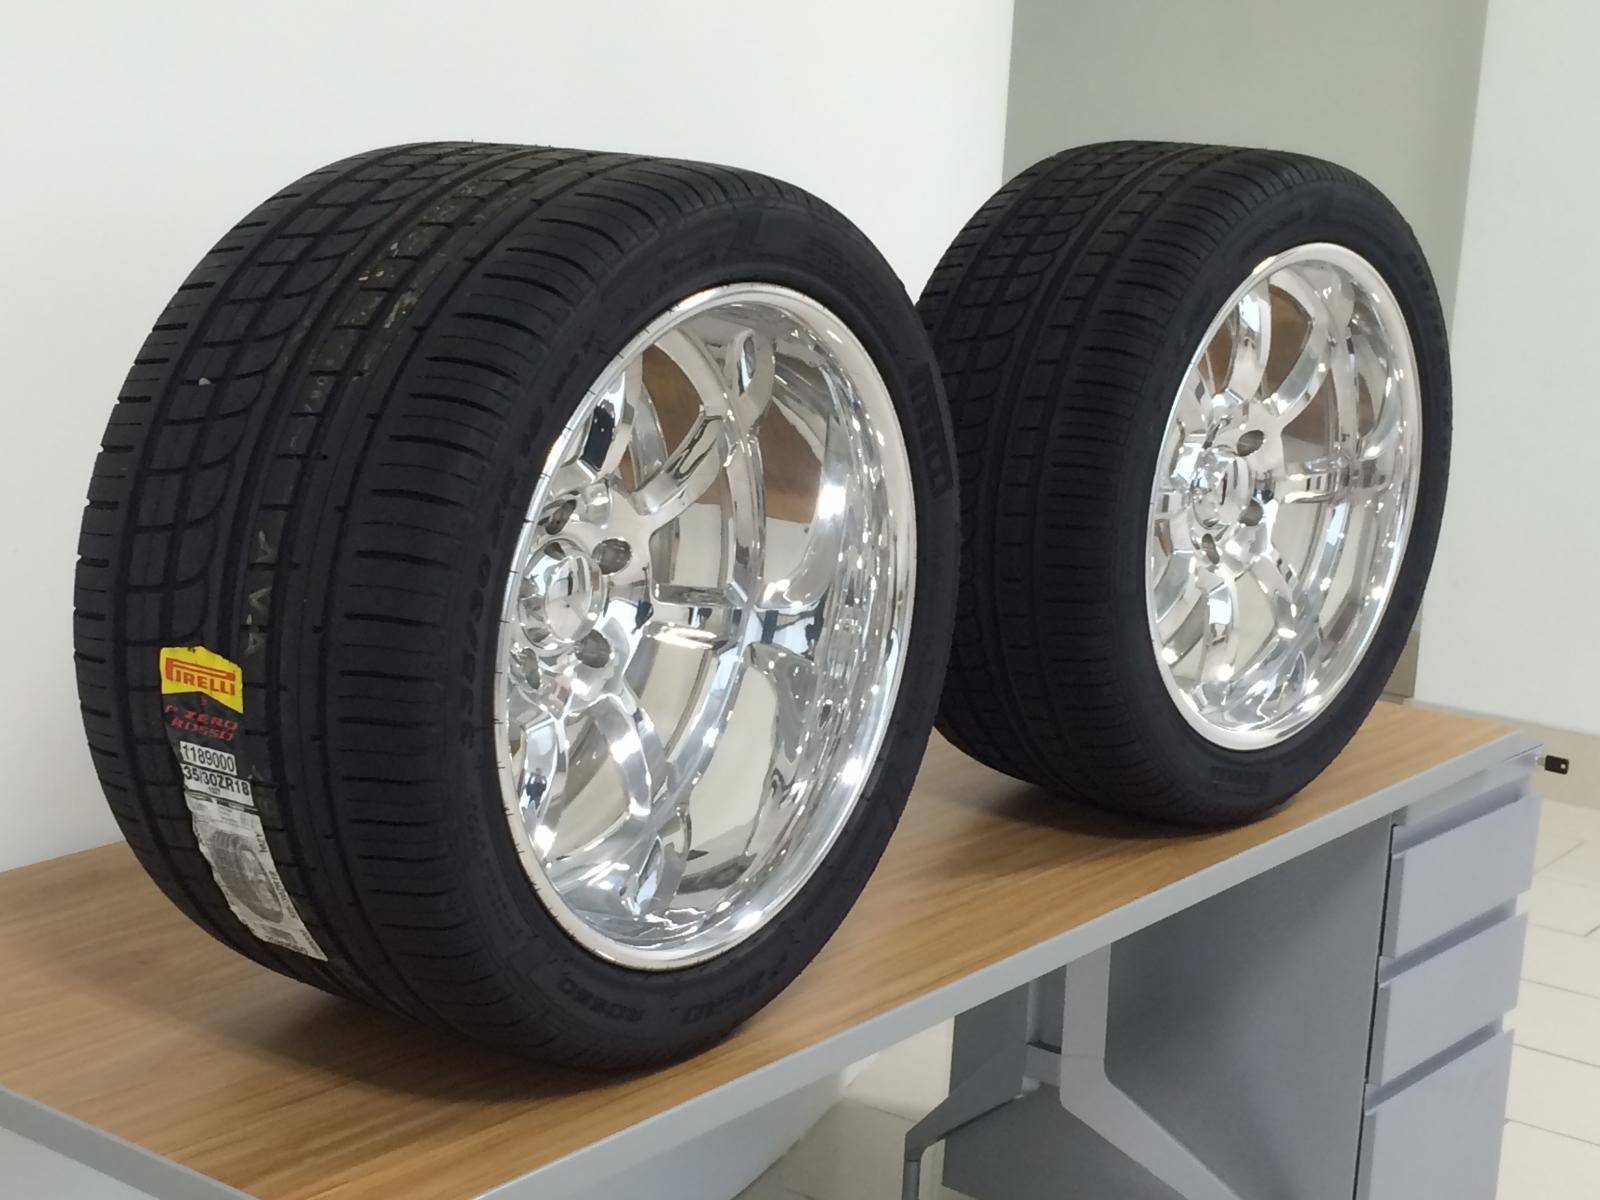 pirelli tires rushforth wheels for 1969 camaro dse set up for sale never used. Black Bedroom Furniture Sets. Home Design Ideas